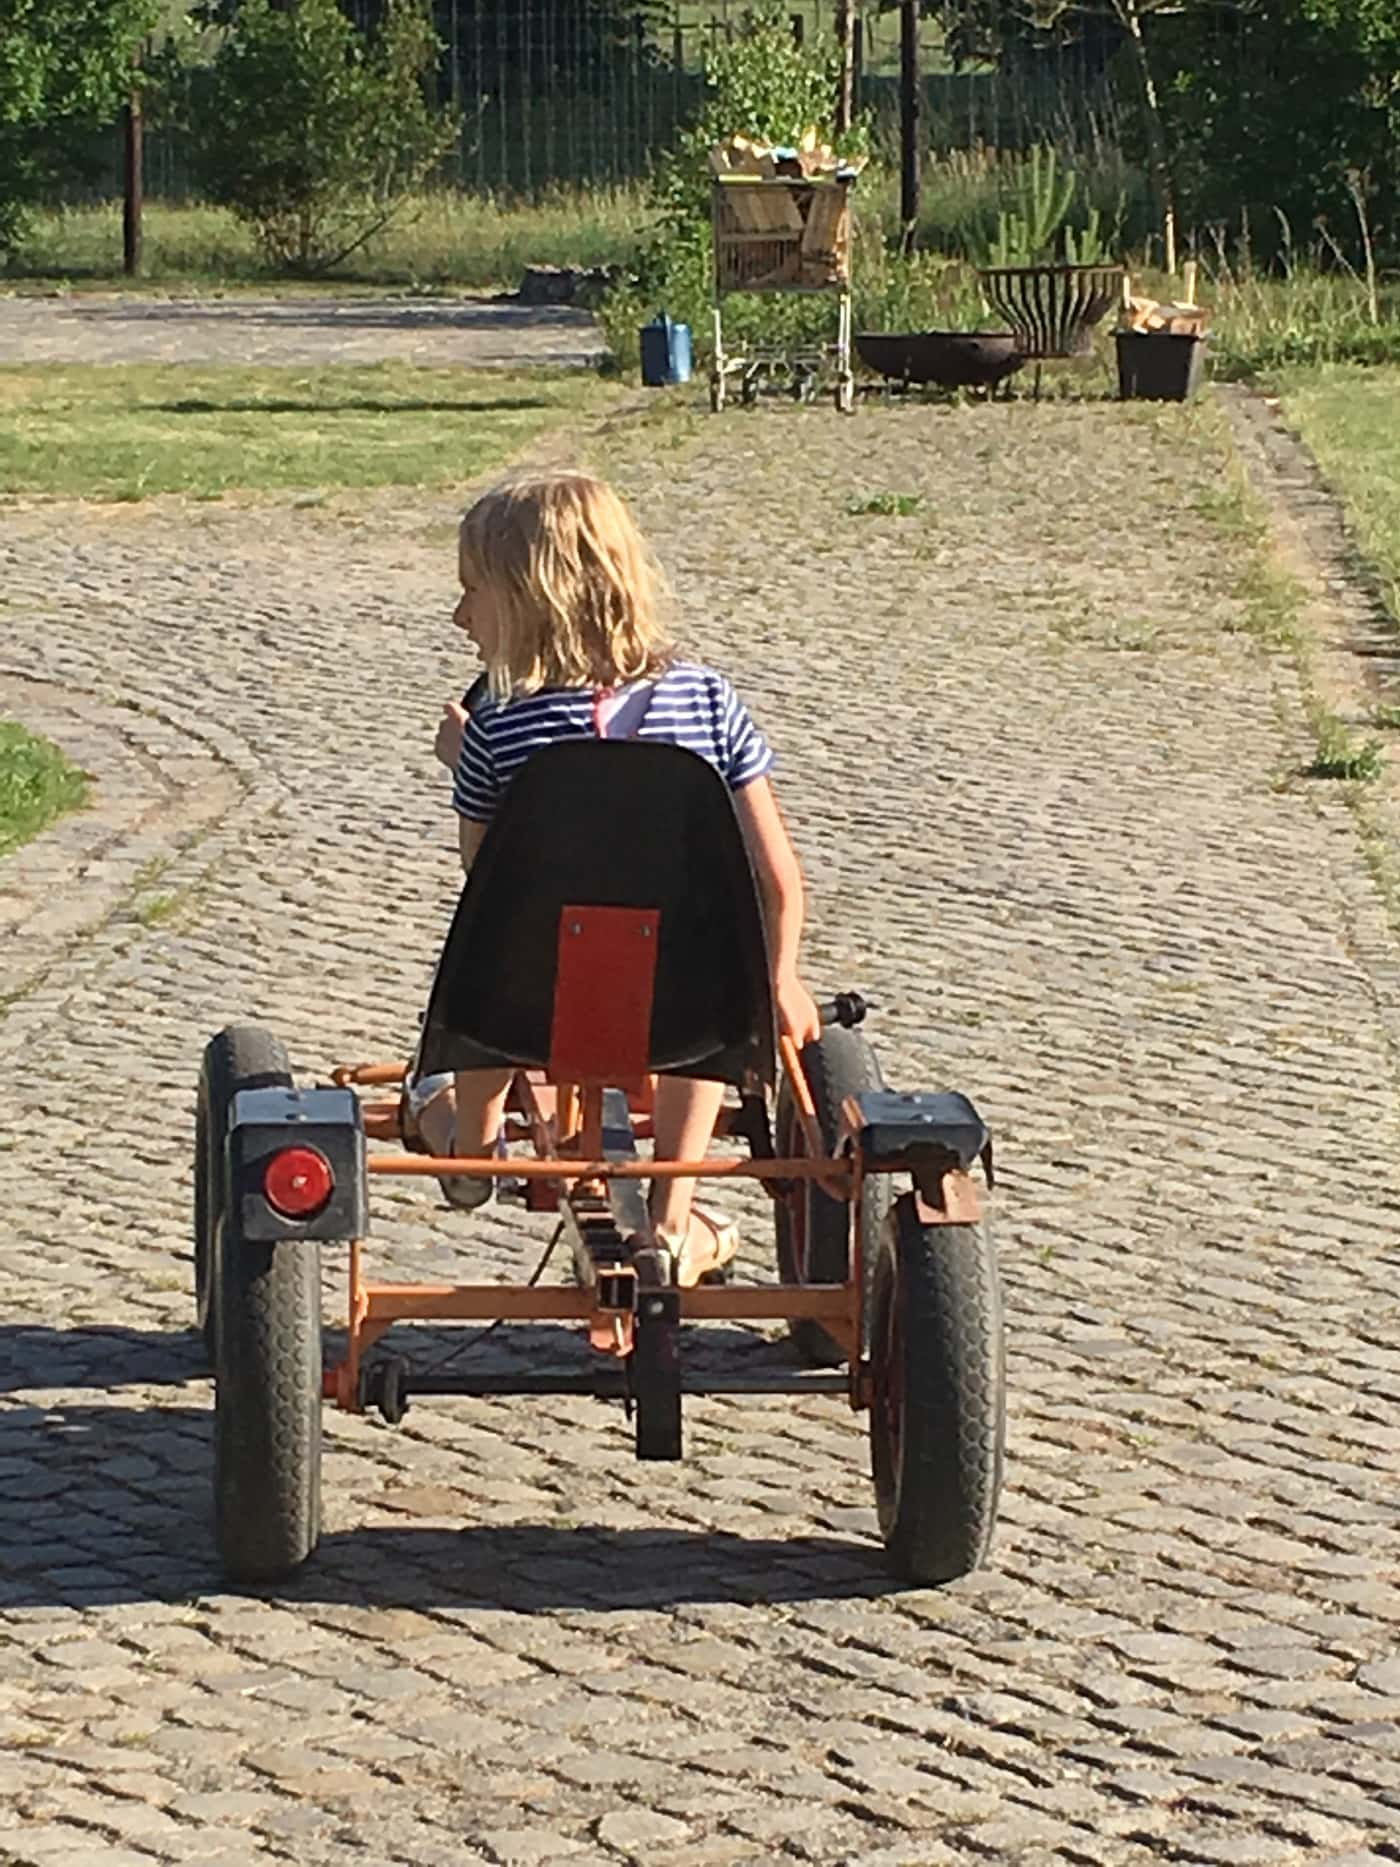 Kind faehrt auf Kettcar // HIMBEER